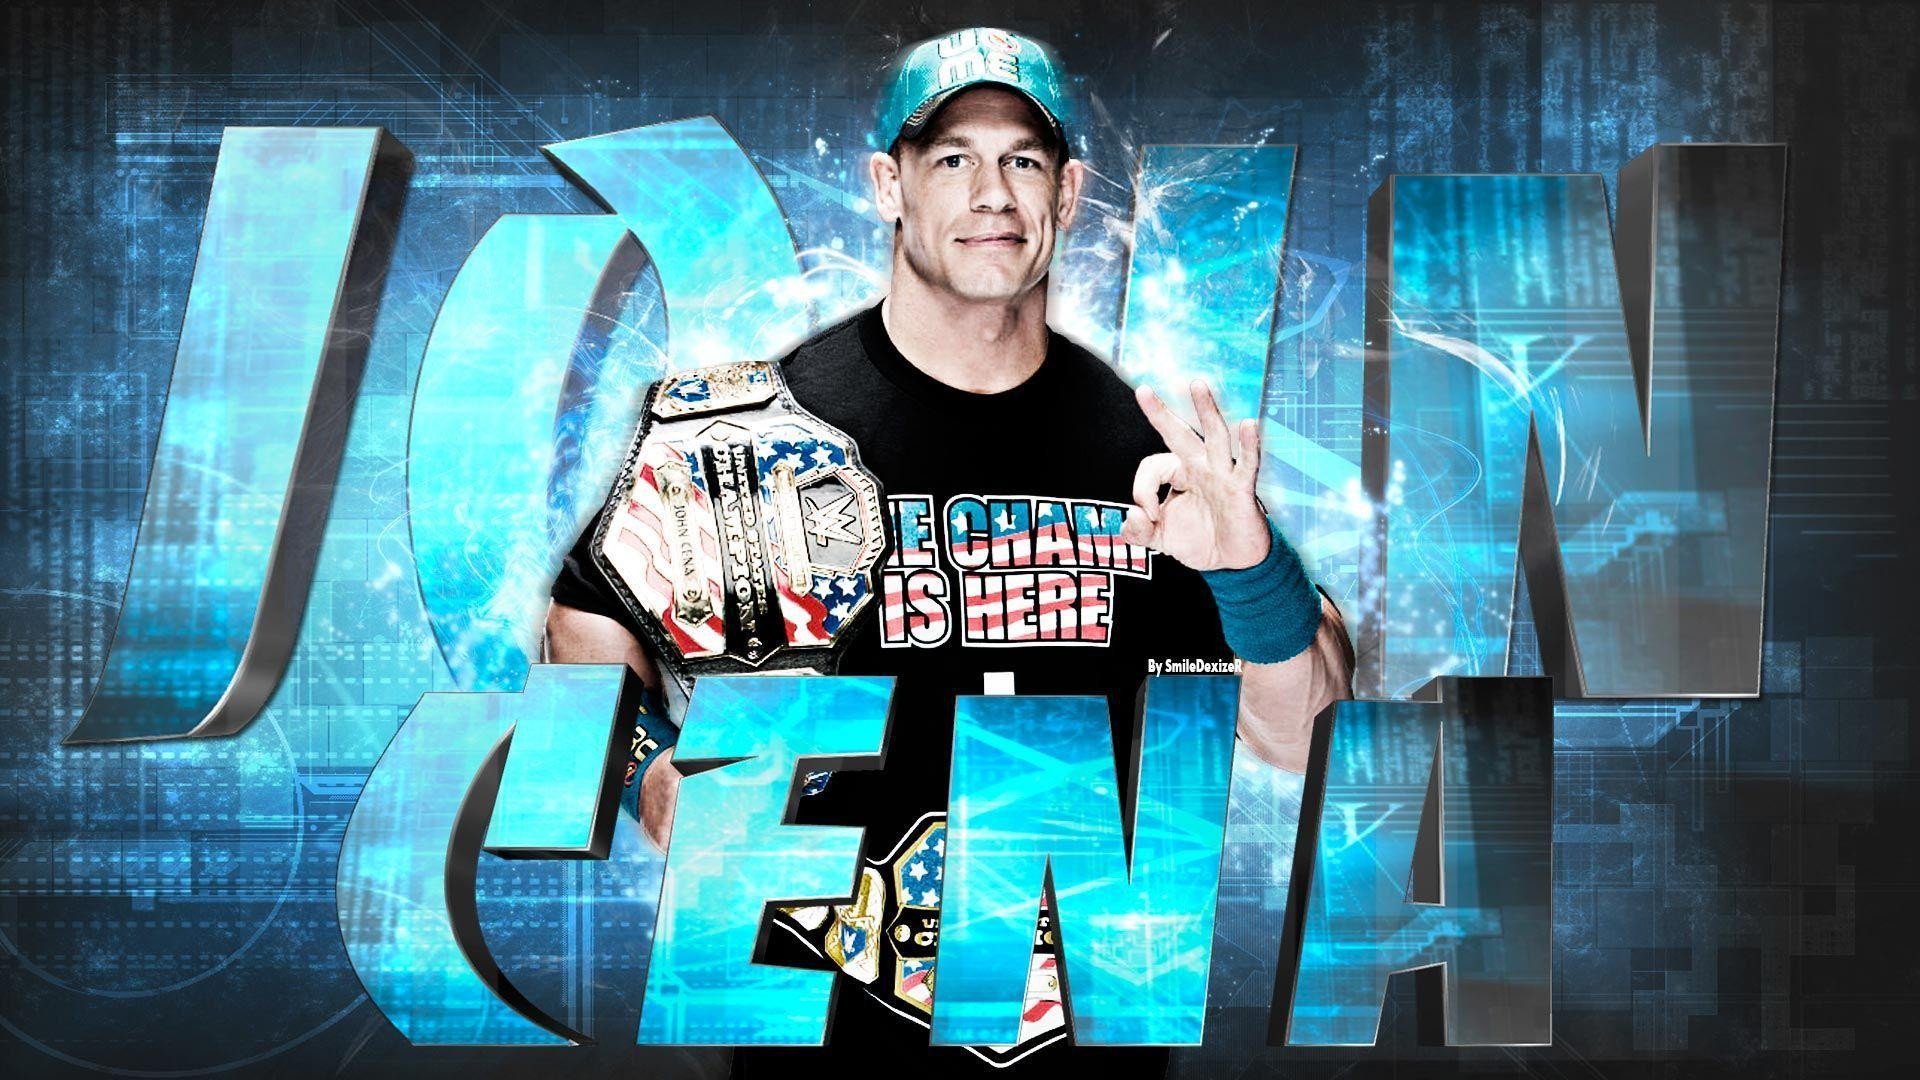 Brock Lesnar def WWE World Heavyweight Champion John Cena